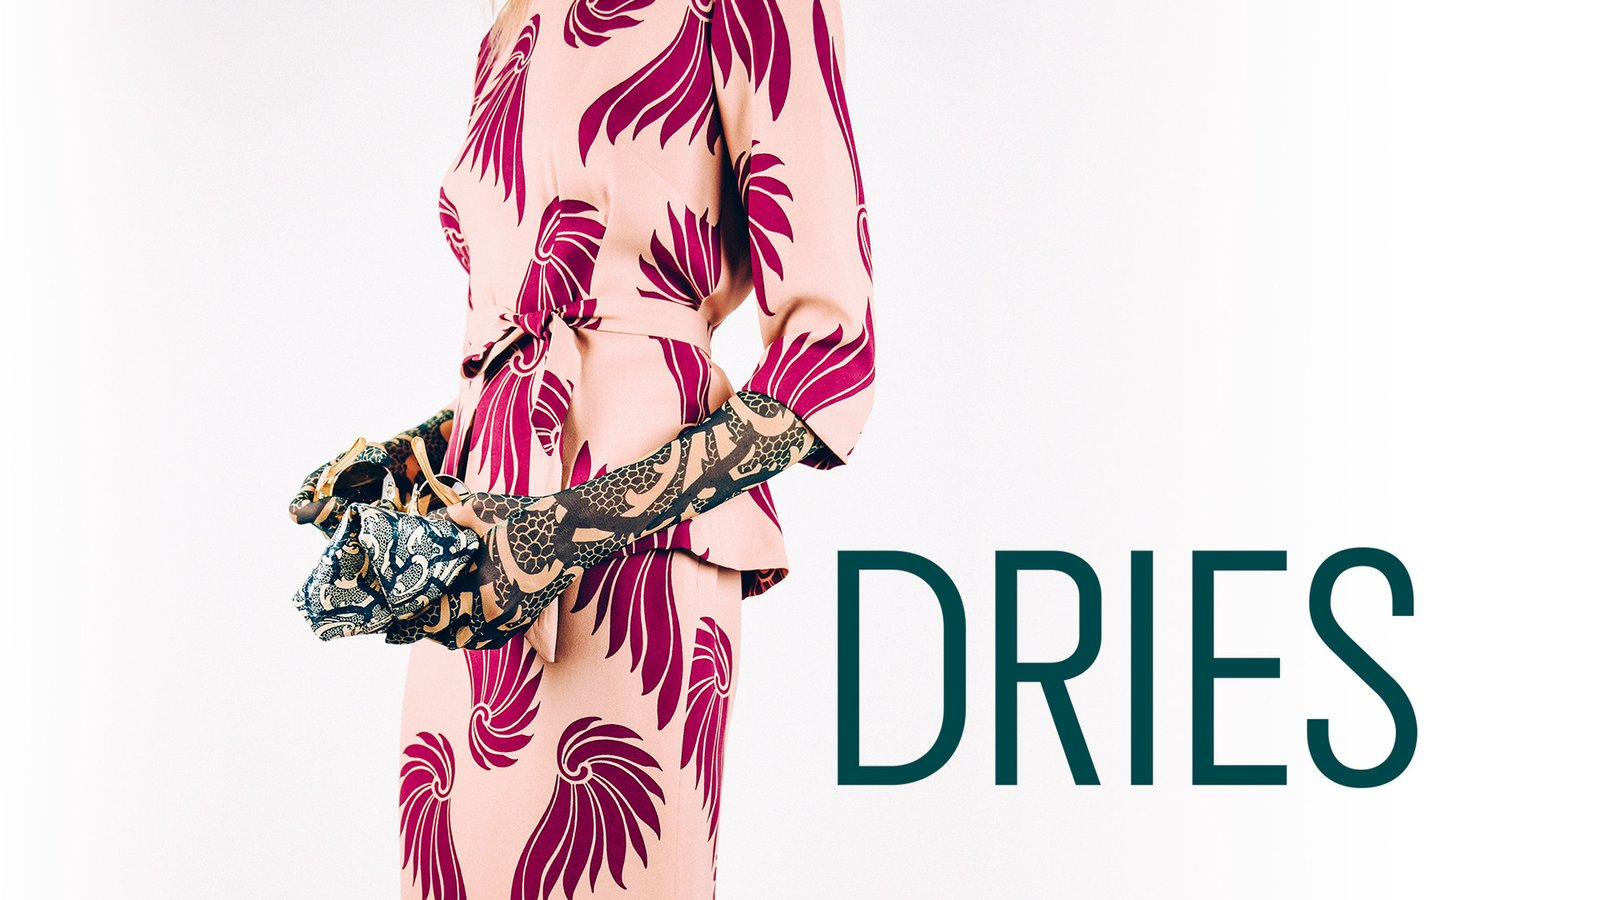 Dries - The Creative Process of a Master Fashion Designer